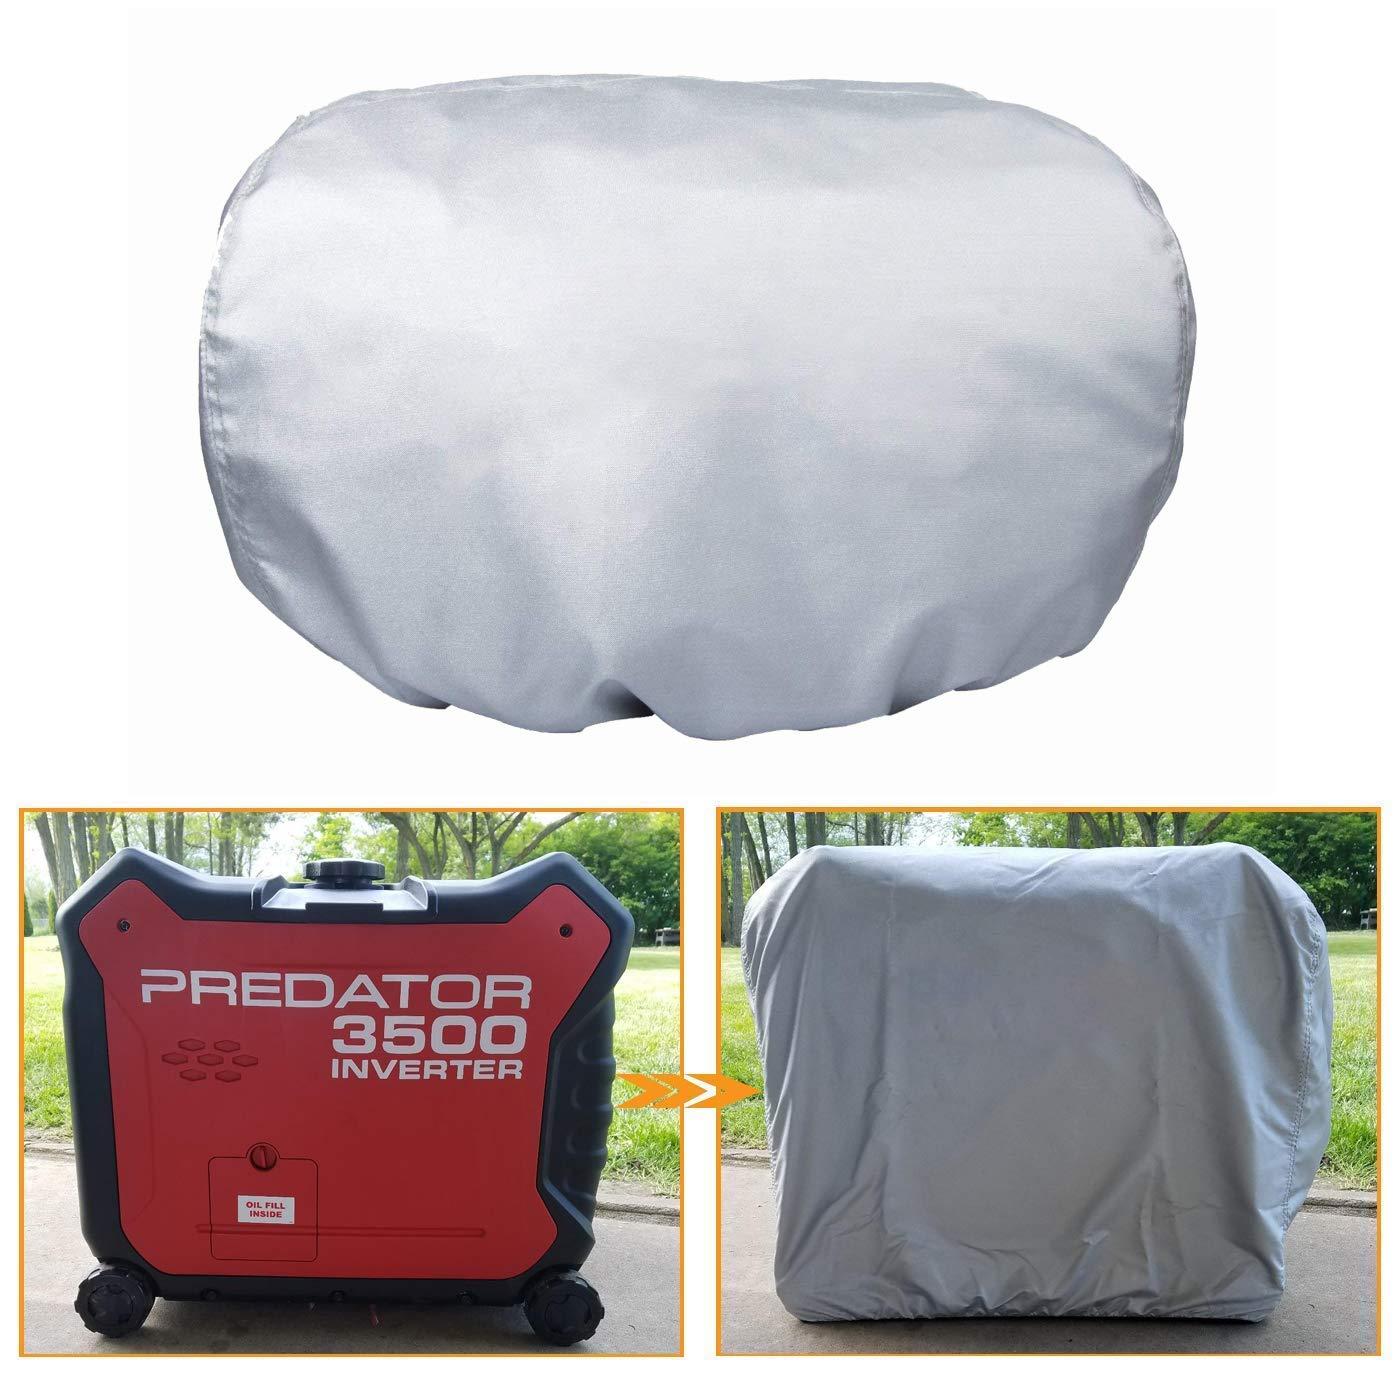 Sunluway Generator Cover-Waterproof Dustproof Sunproof for Honda EU3000is & Predator 3500